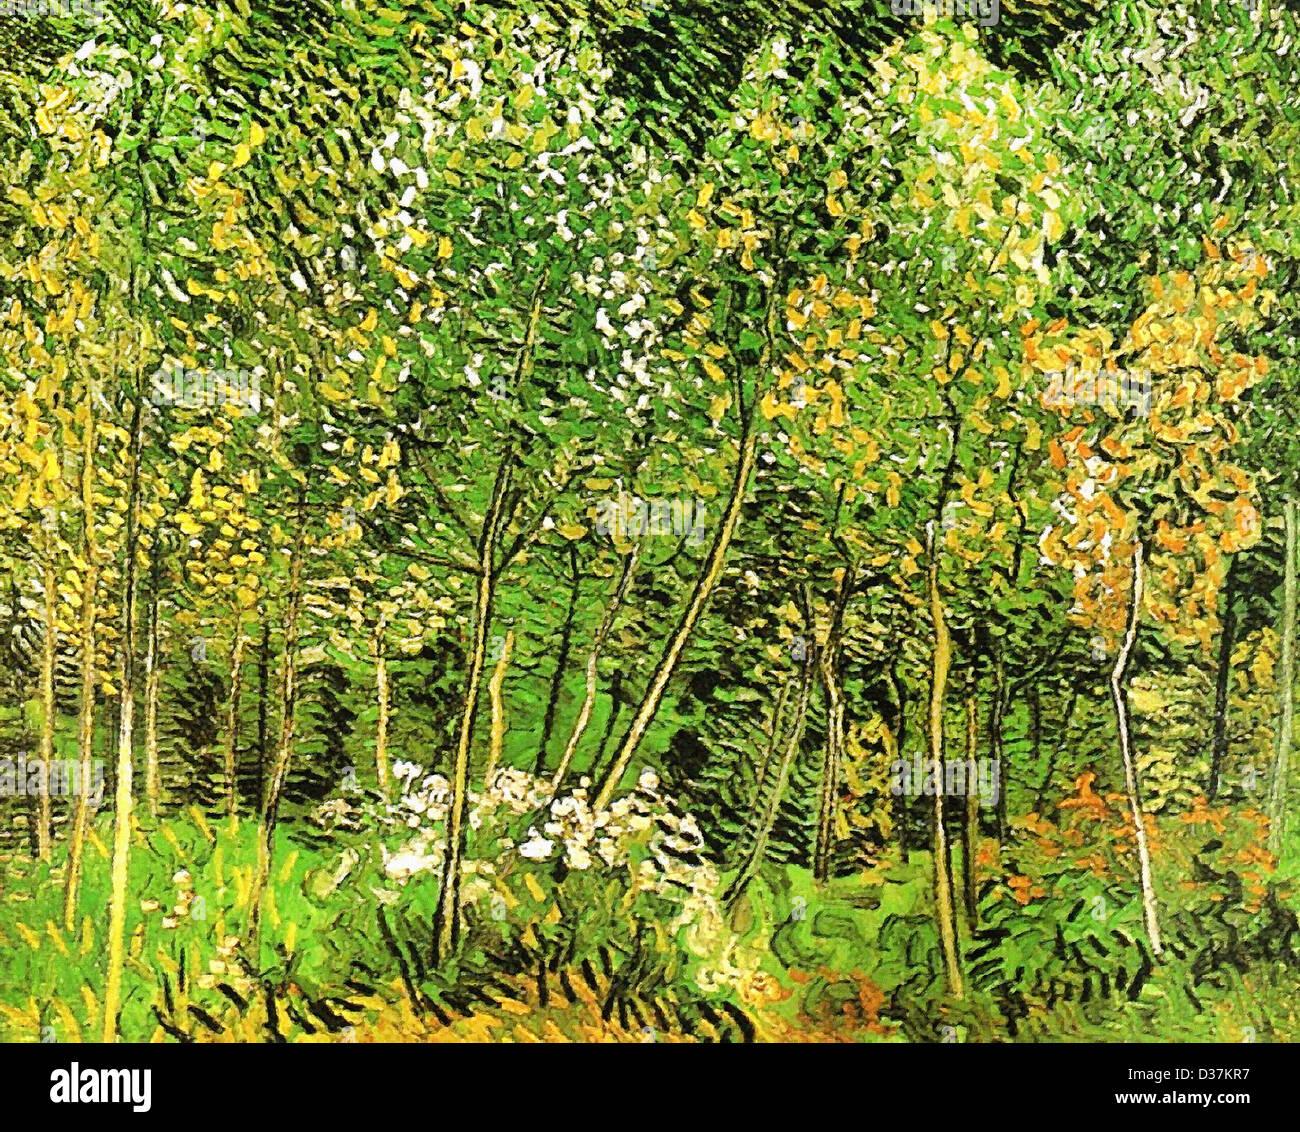 Vincent van Gogh, il Grove.1890. Post-Impressionism. Olio su tela. Immagini Stock